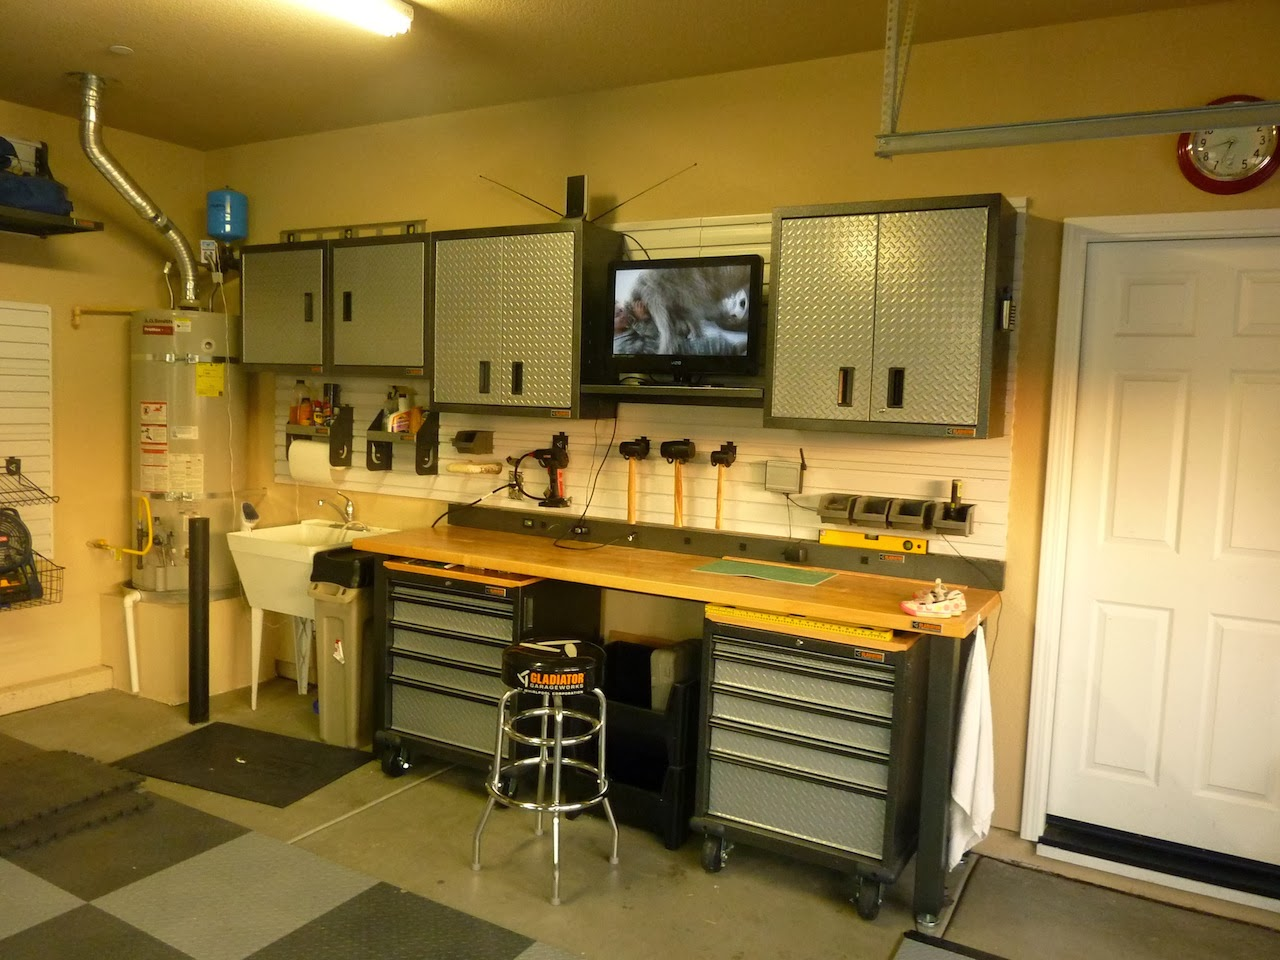 3 Years Later More Gearwall Installation  MATT s GARAGE BLOG. Husky Garage Storage Reviews